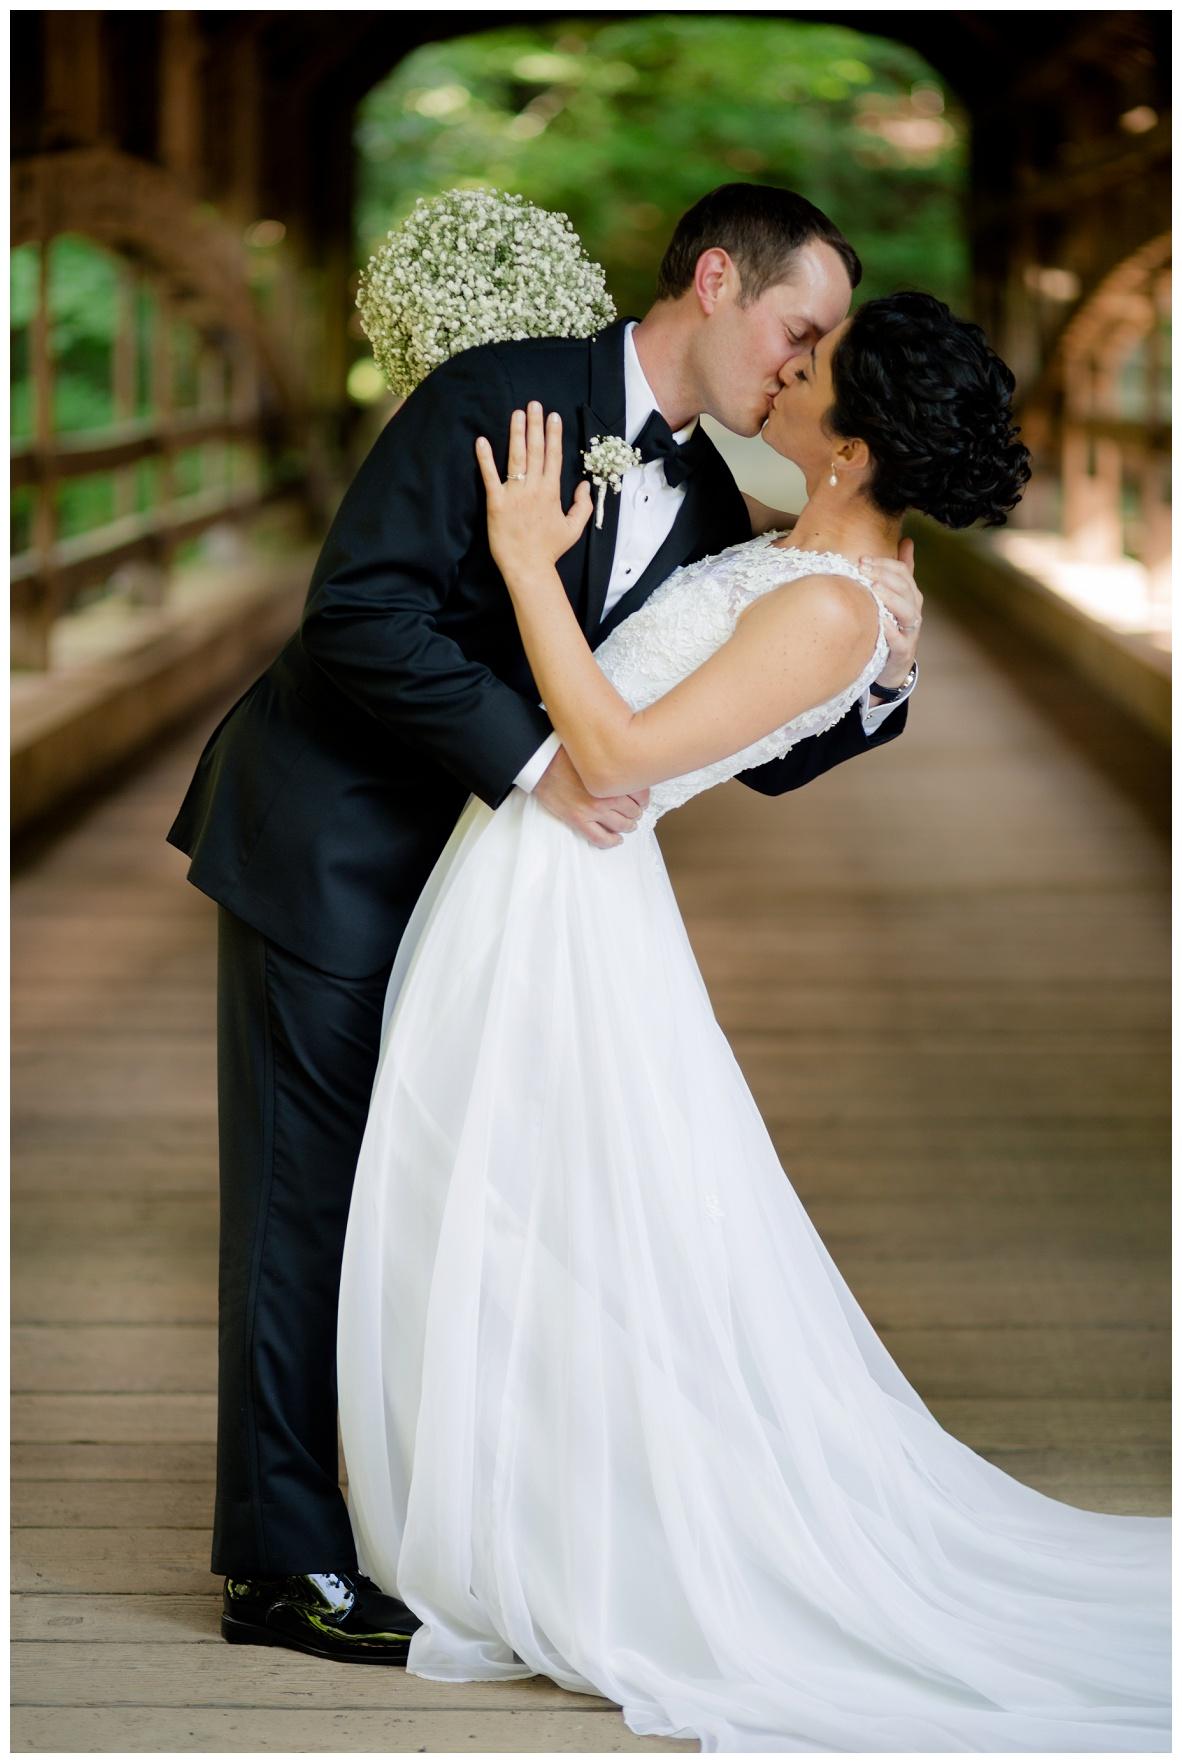 The Wedding of Danielle and Matt_0056.jpg